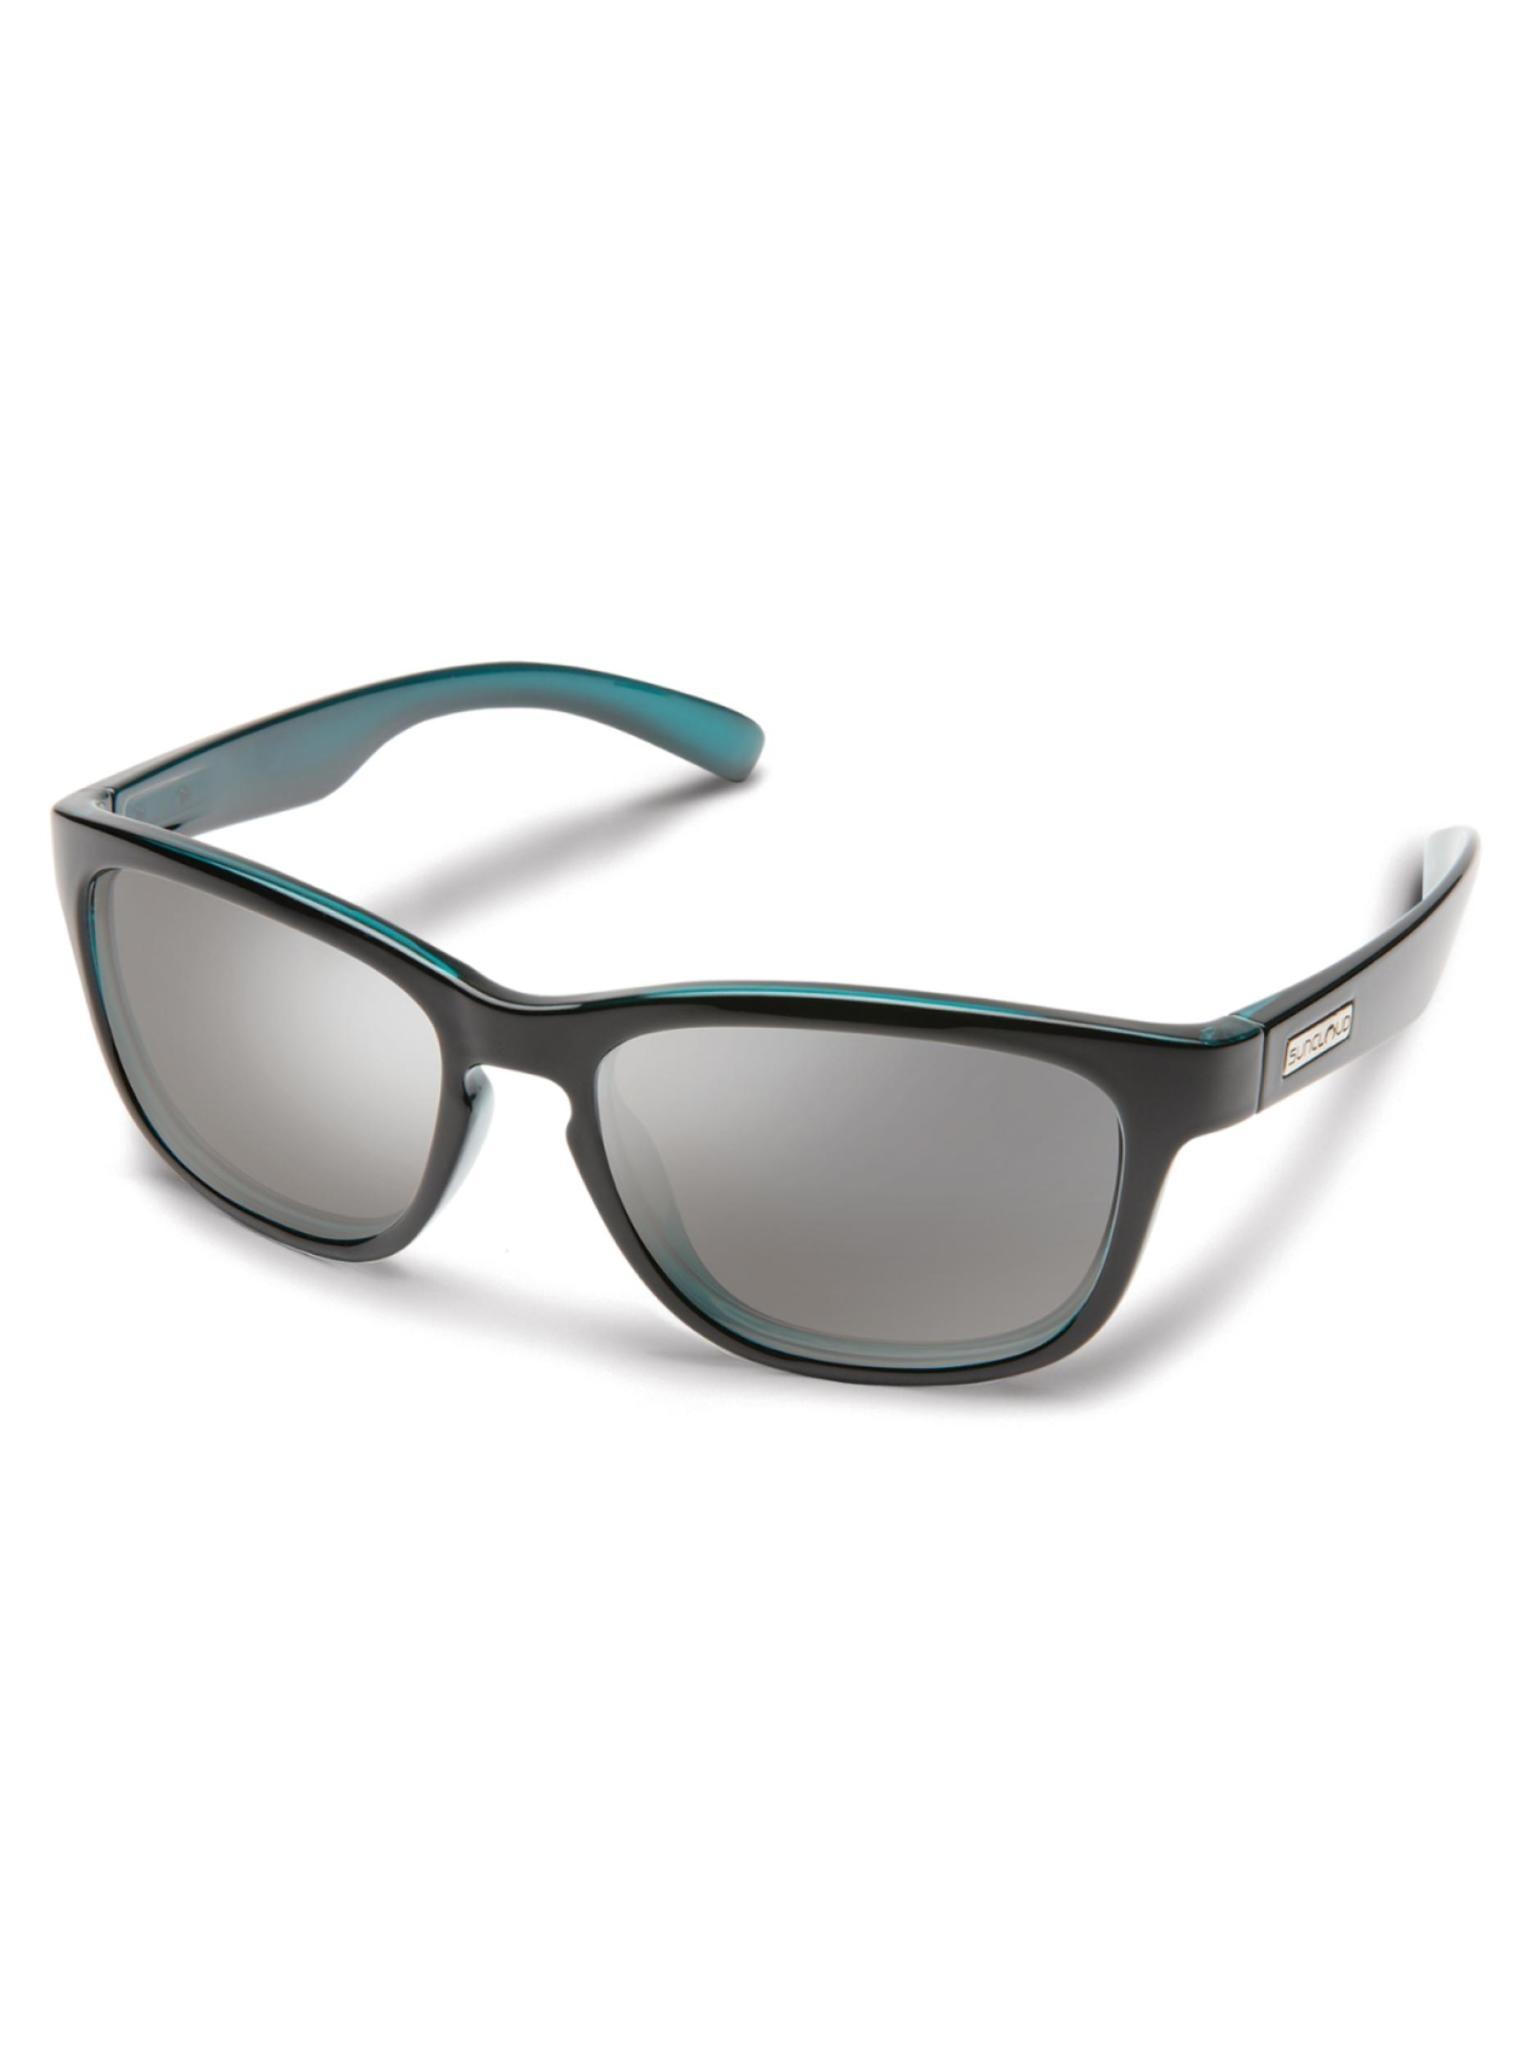 Cinco Sunglasses Aqua Backpaint Polarized Silver Mirror